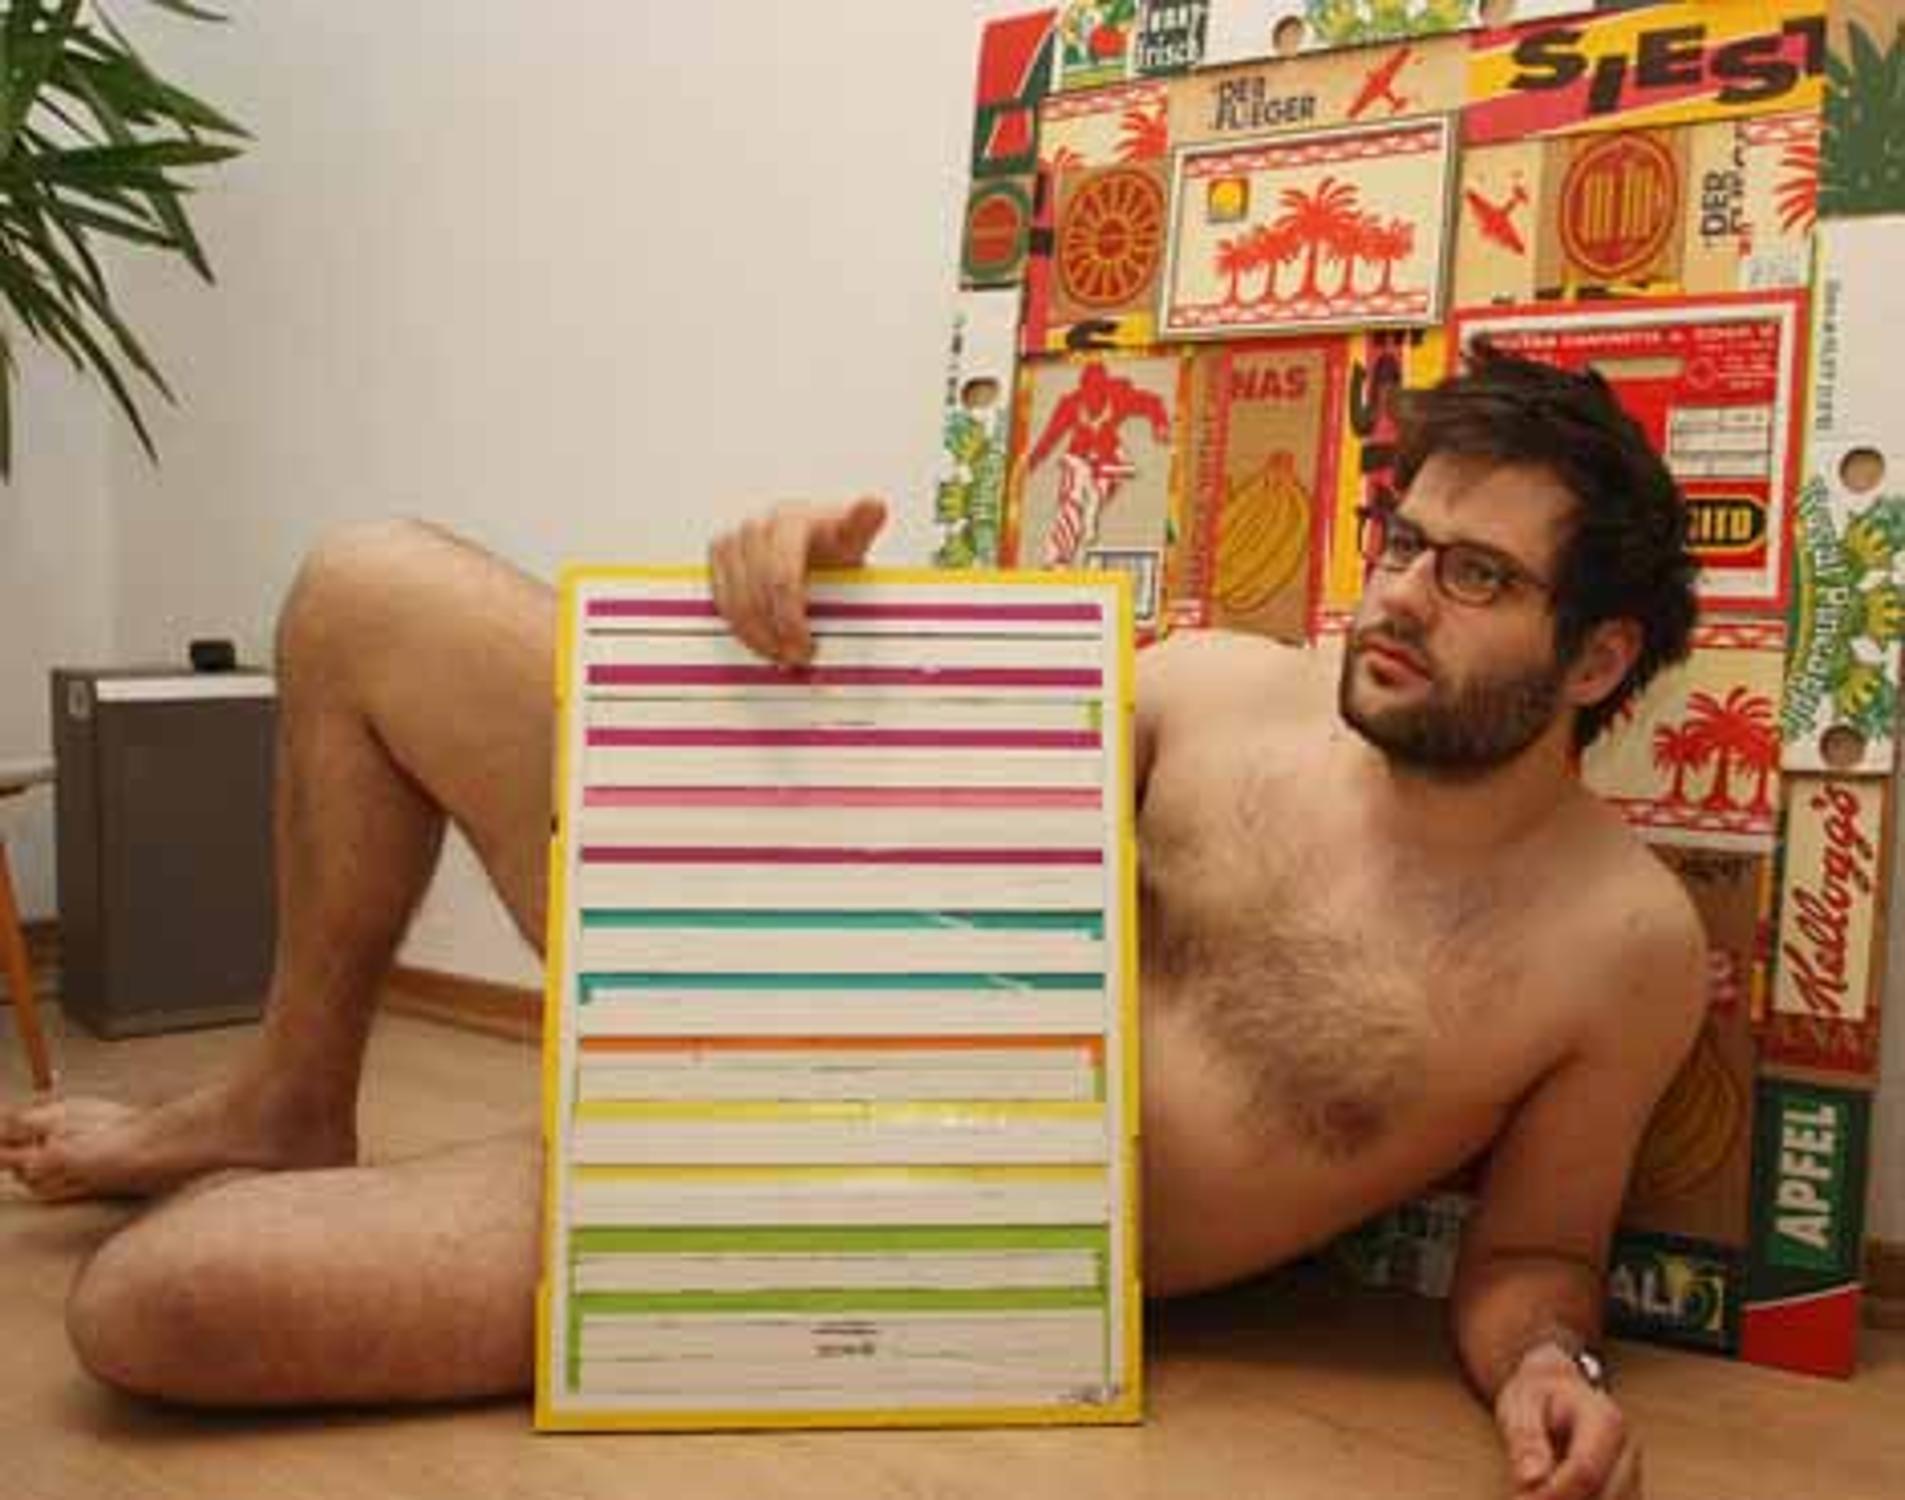 Alex Spencer Nude Photo New Collection - 7 Photos pics